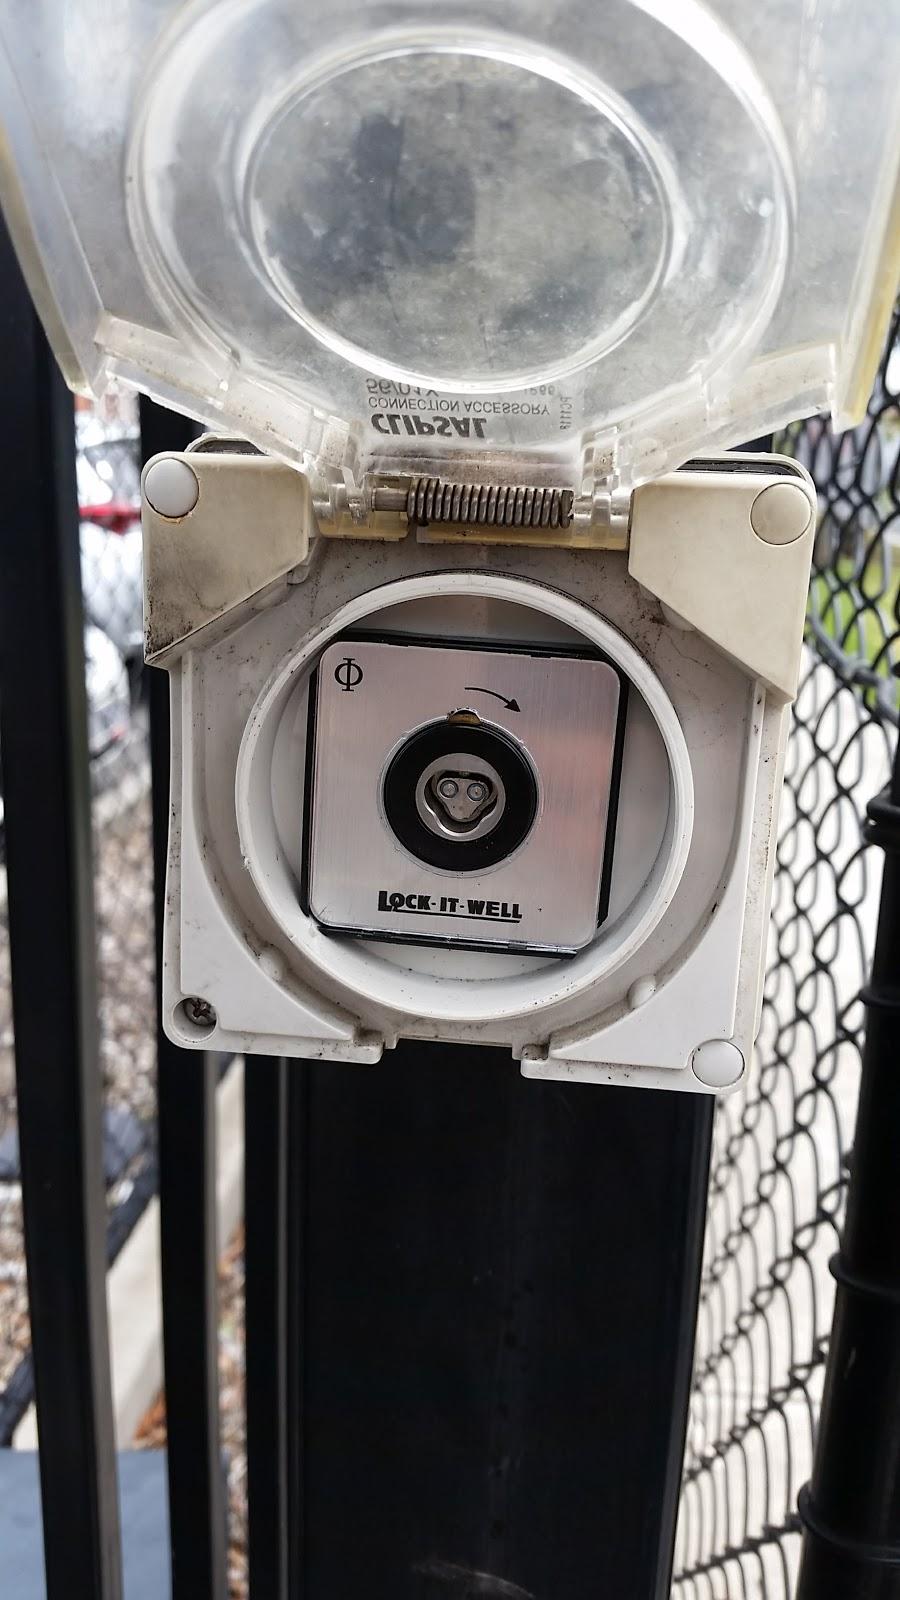 The Locksmith Guru | locksmith | 18 Aberdeen St, Reservoir VIC 3073, Australia | 0425754393 OR +61 425 754 393